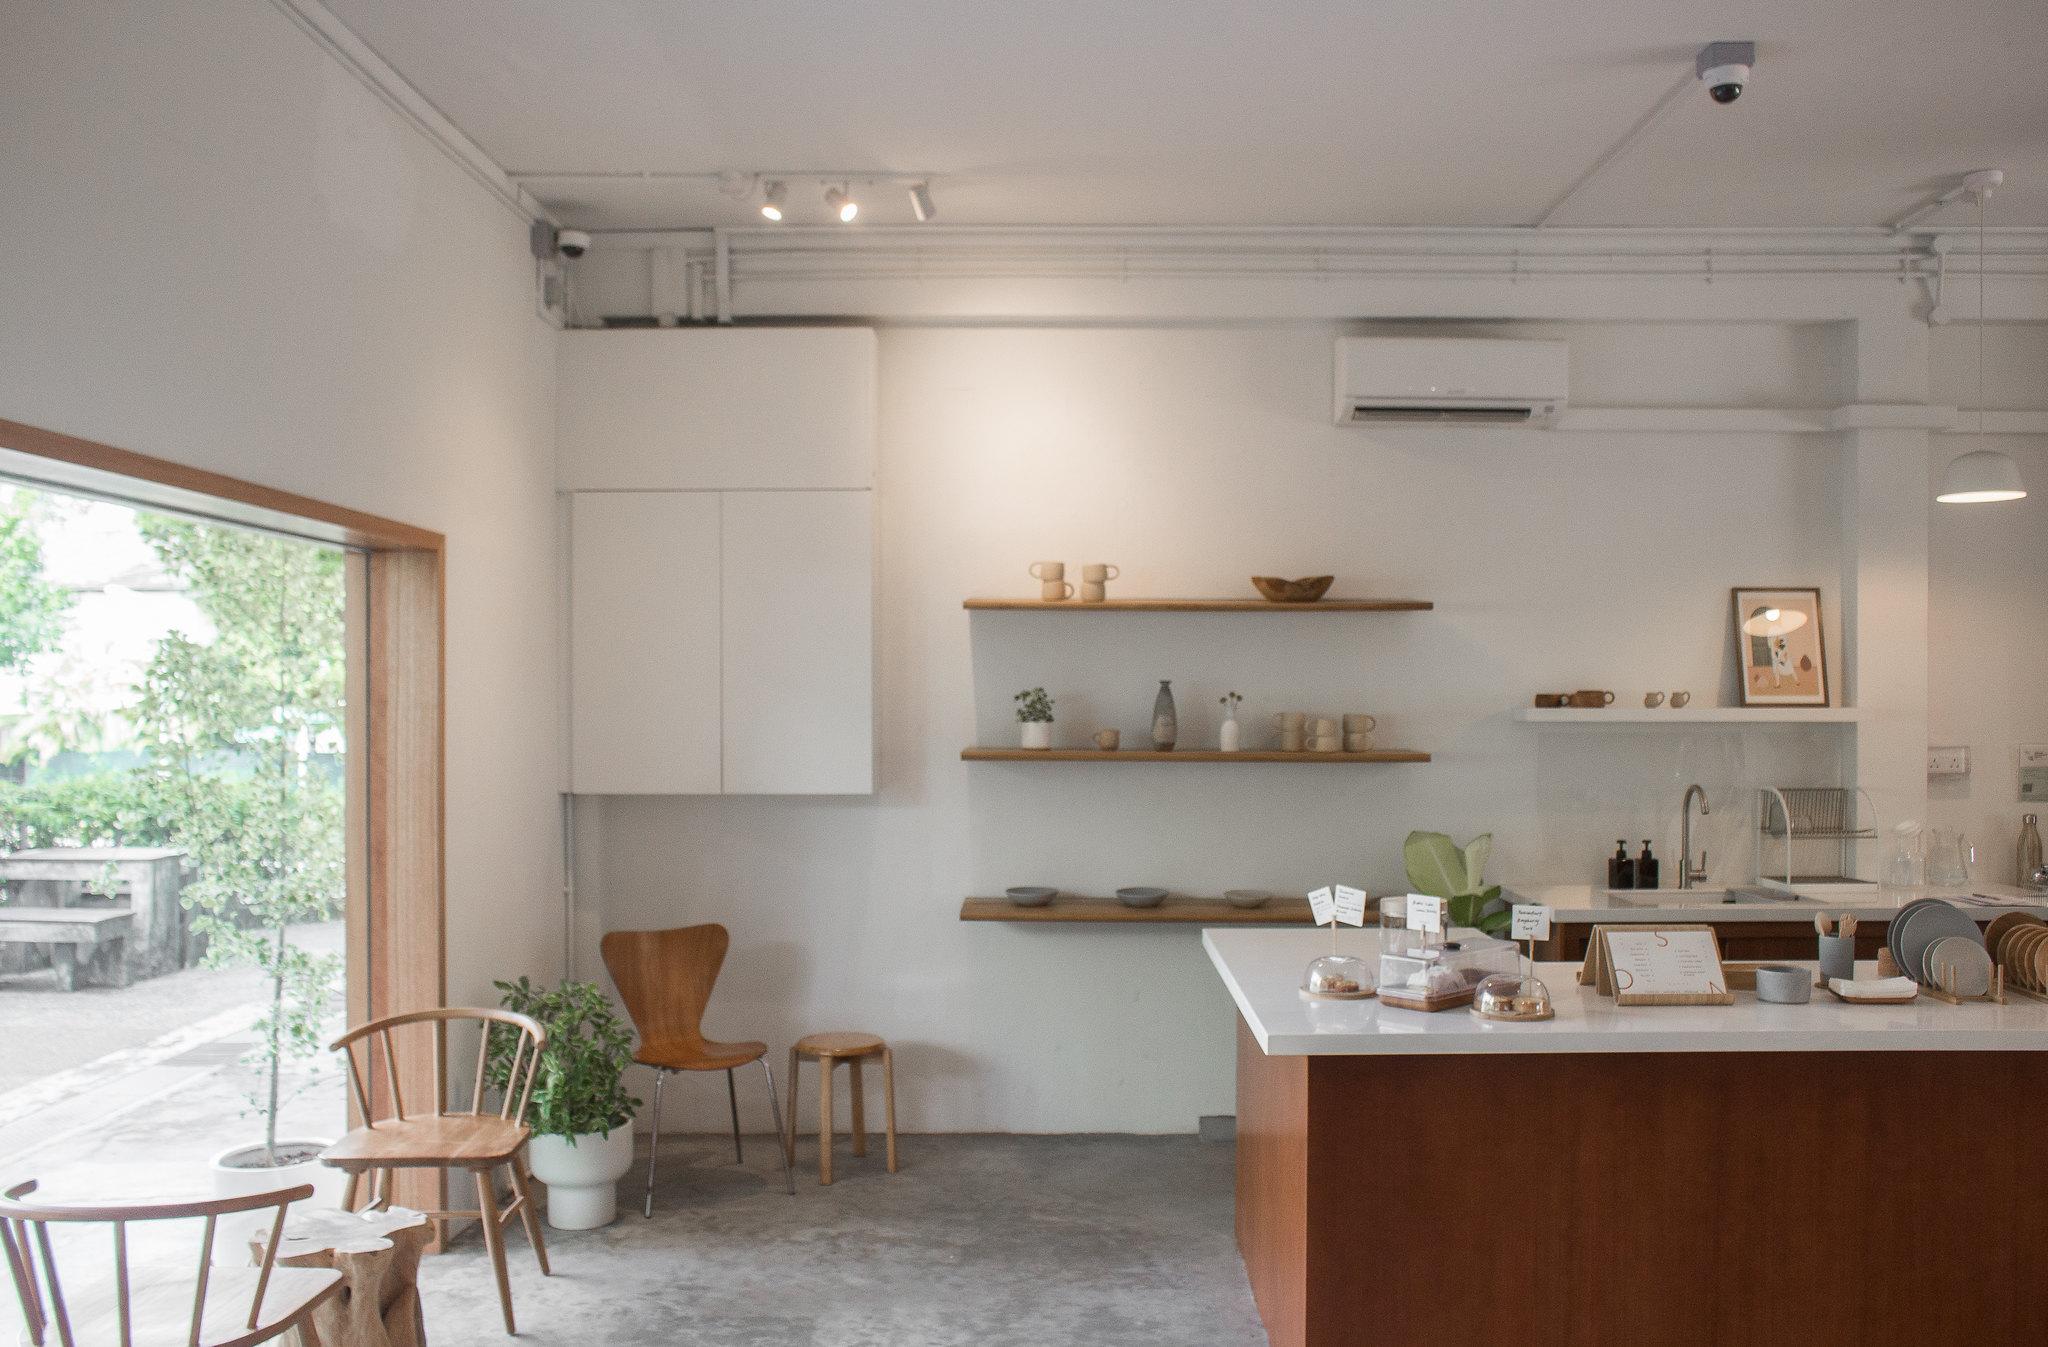 Our Second Home Cafe Singapore